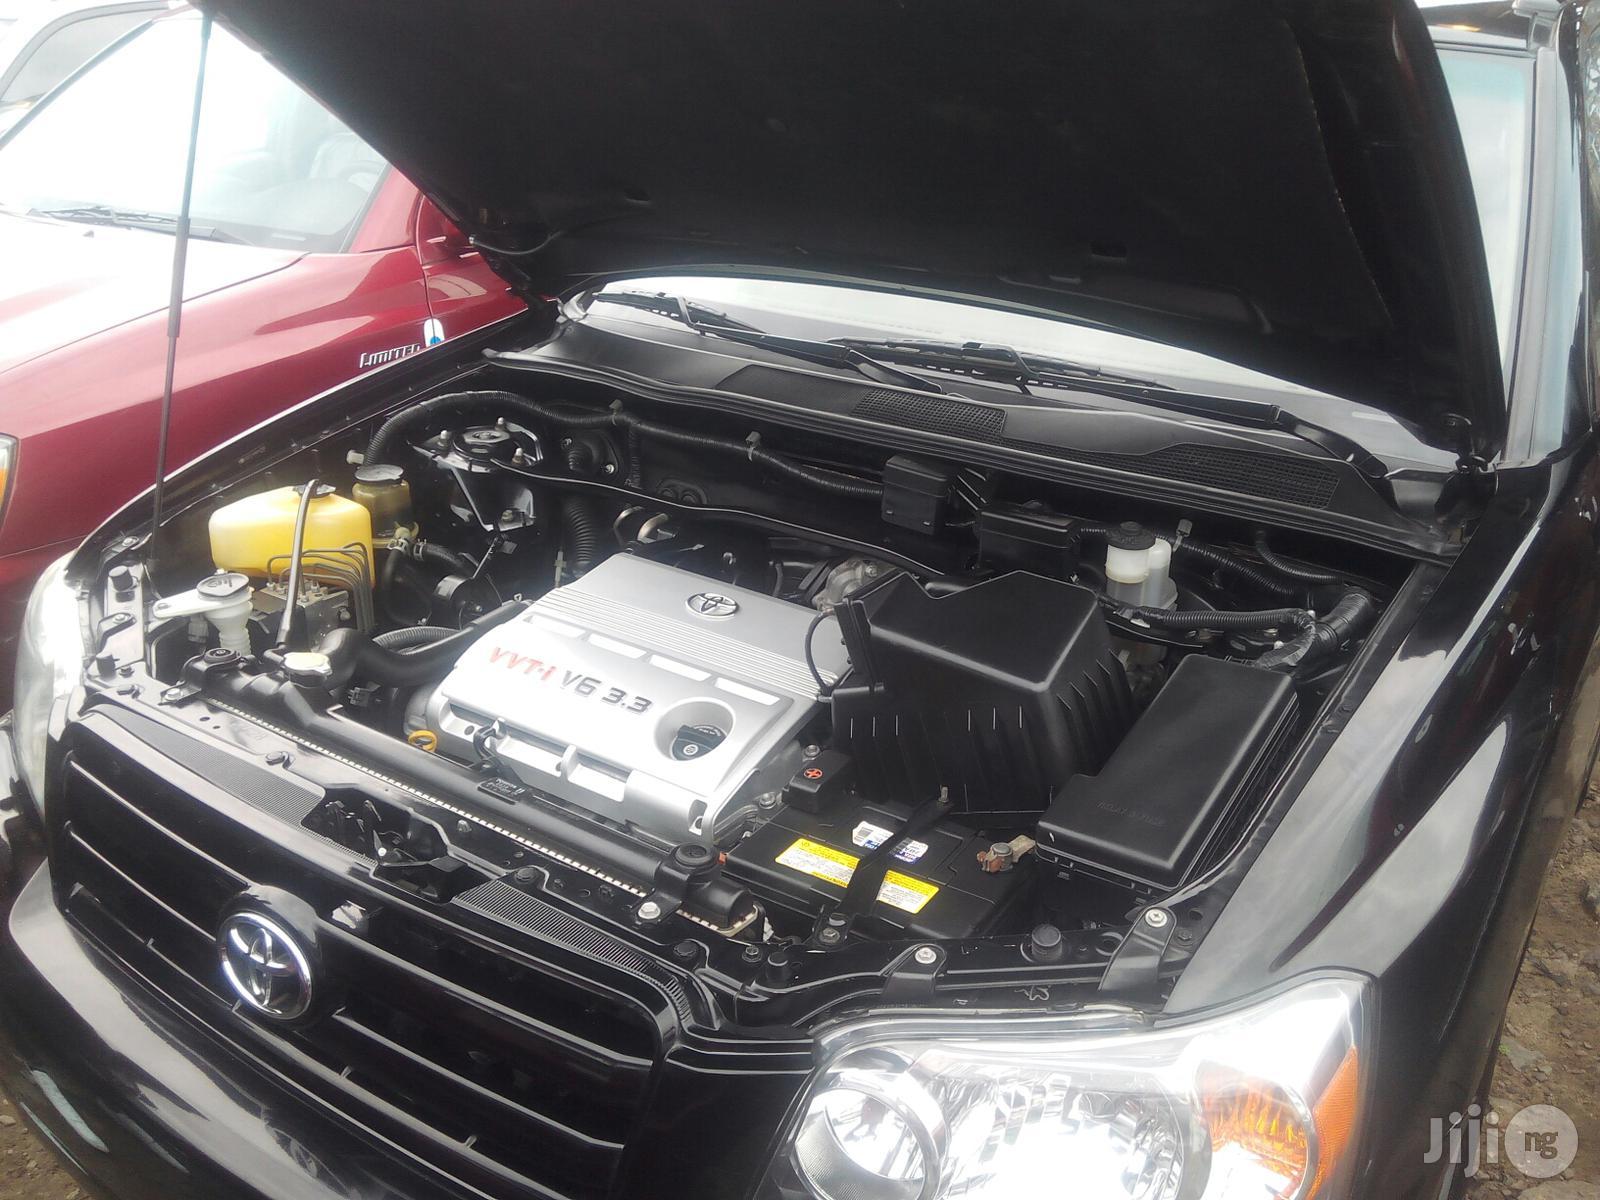 Toyota Highlander 2005 Limited V6 Black   Cars for sale in Amuwo-Odofin, Lagos State, Nigeria